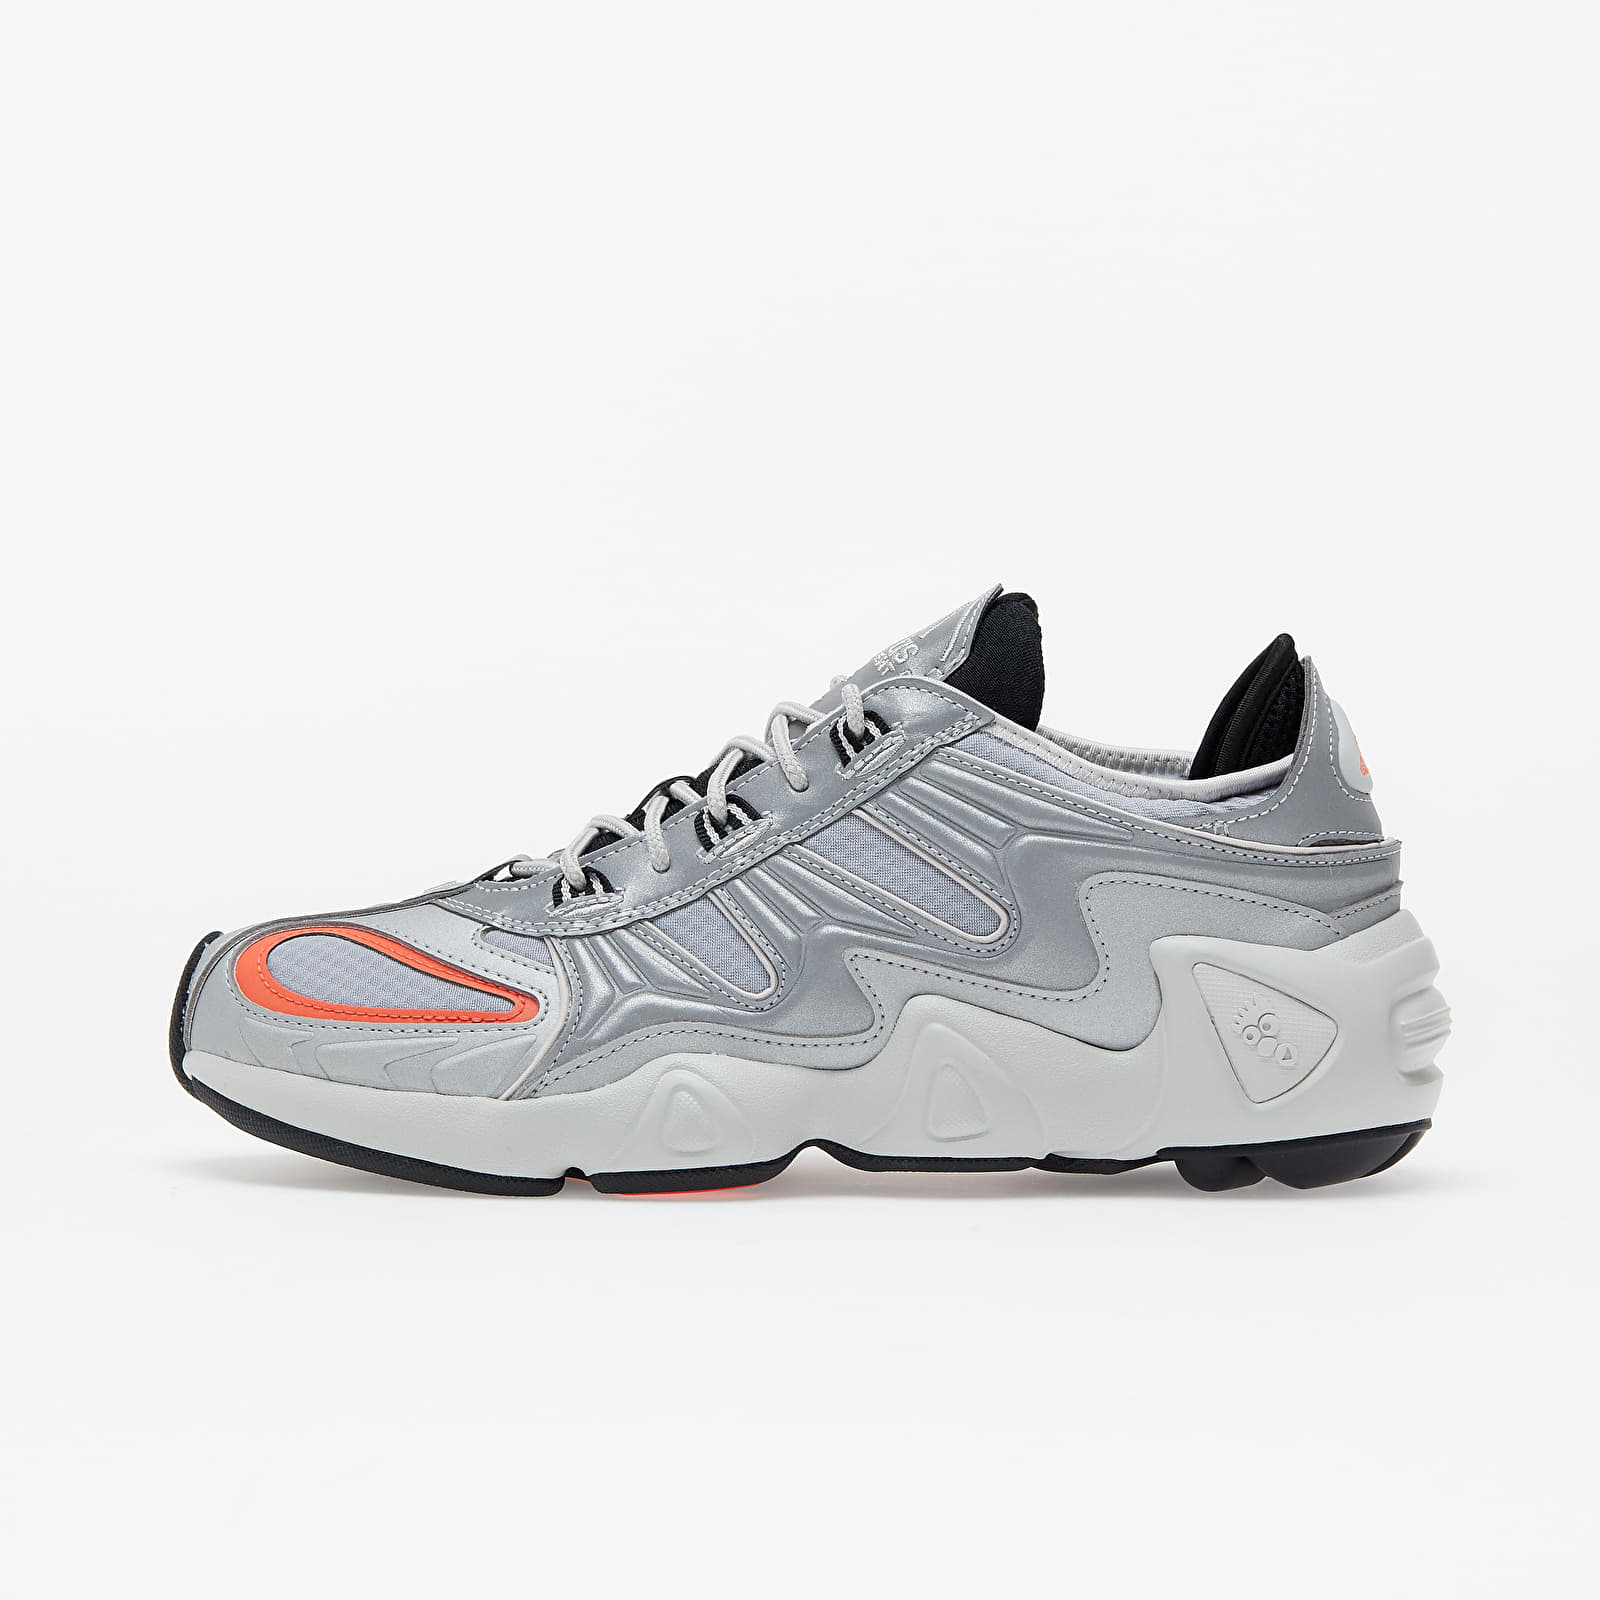 Férfi cipők adidas FYW S-97 Silver Mate/ Silver Mate/ Solar Red